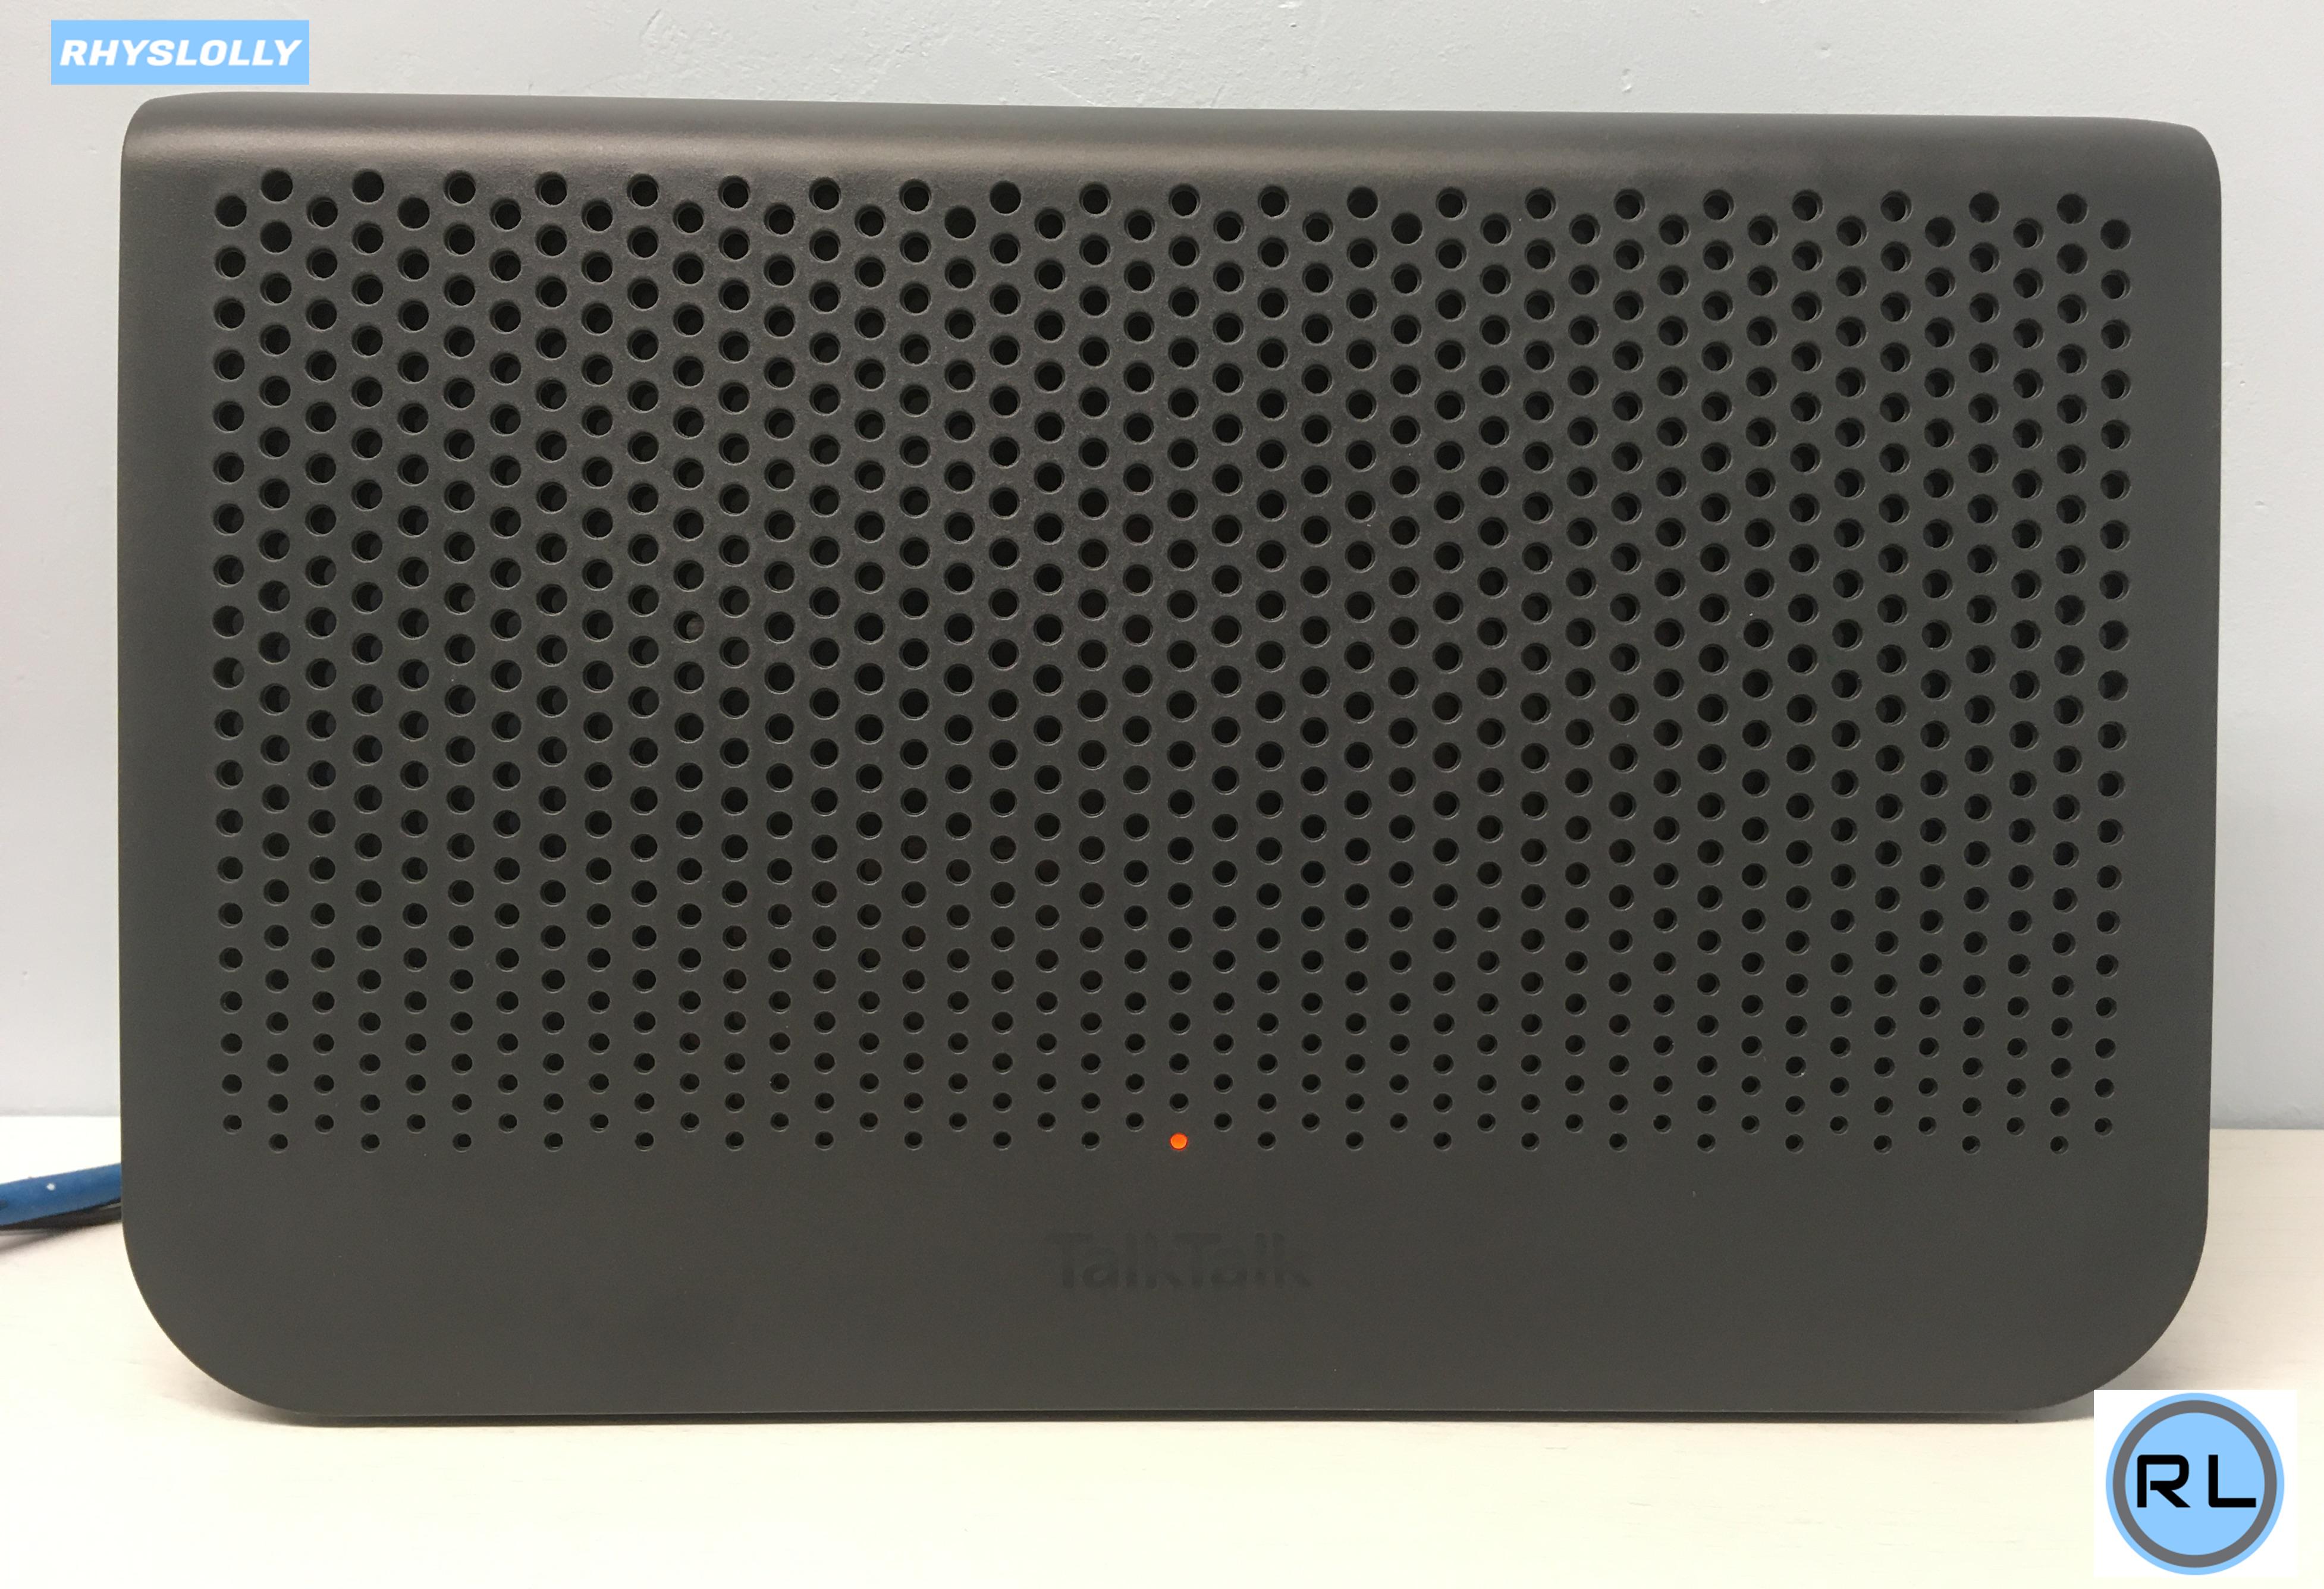 TalkTalk WiFi Hub Black (Huawei DG8041W) Review, Test and Tear-down